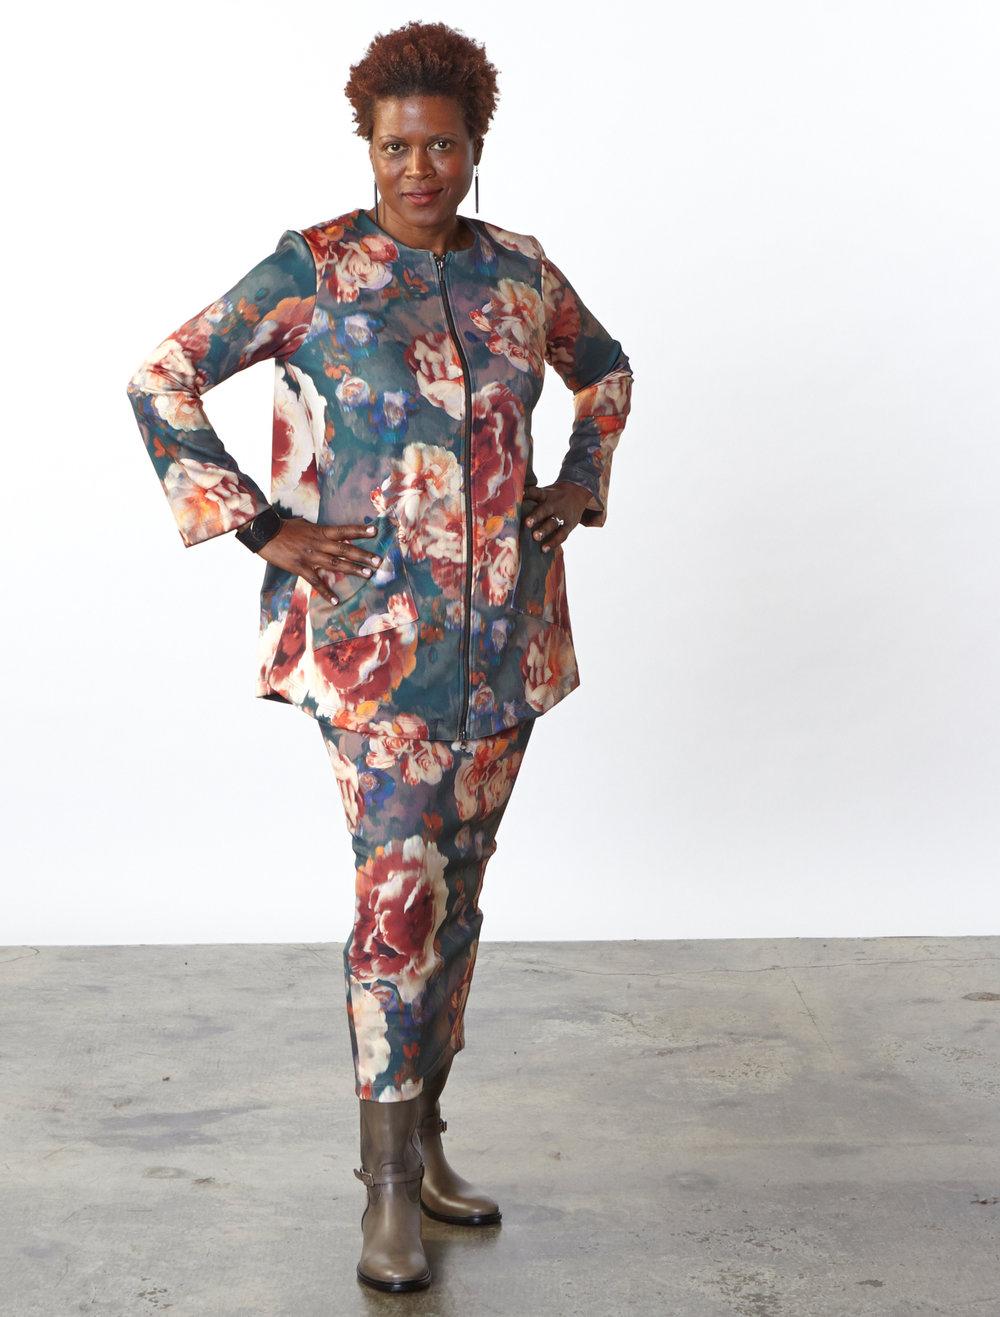 Jupiter Jacket, Slim Skirt in Fiori Italian Print Scuba